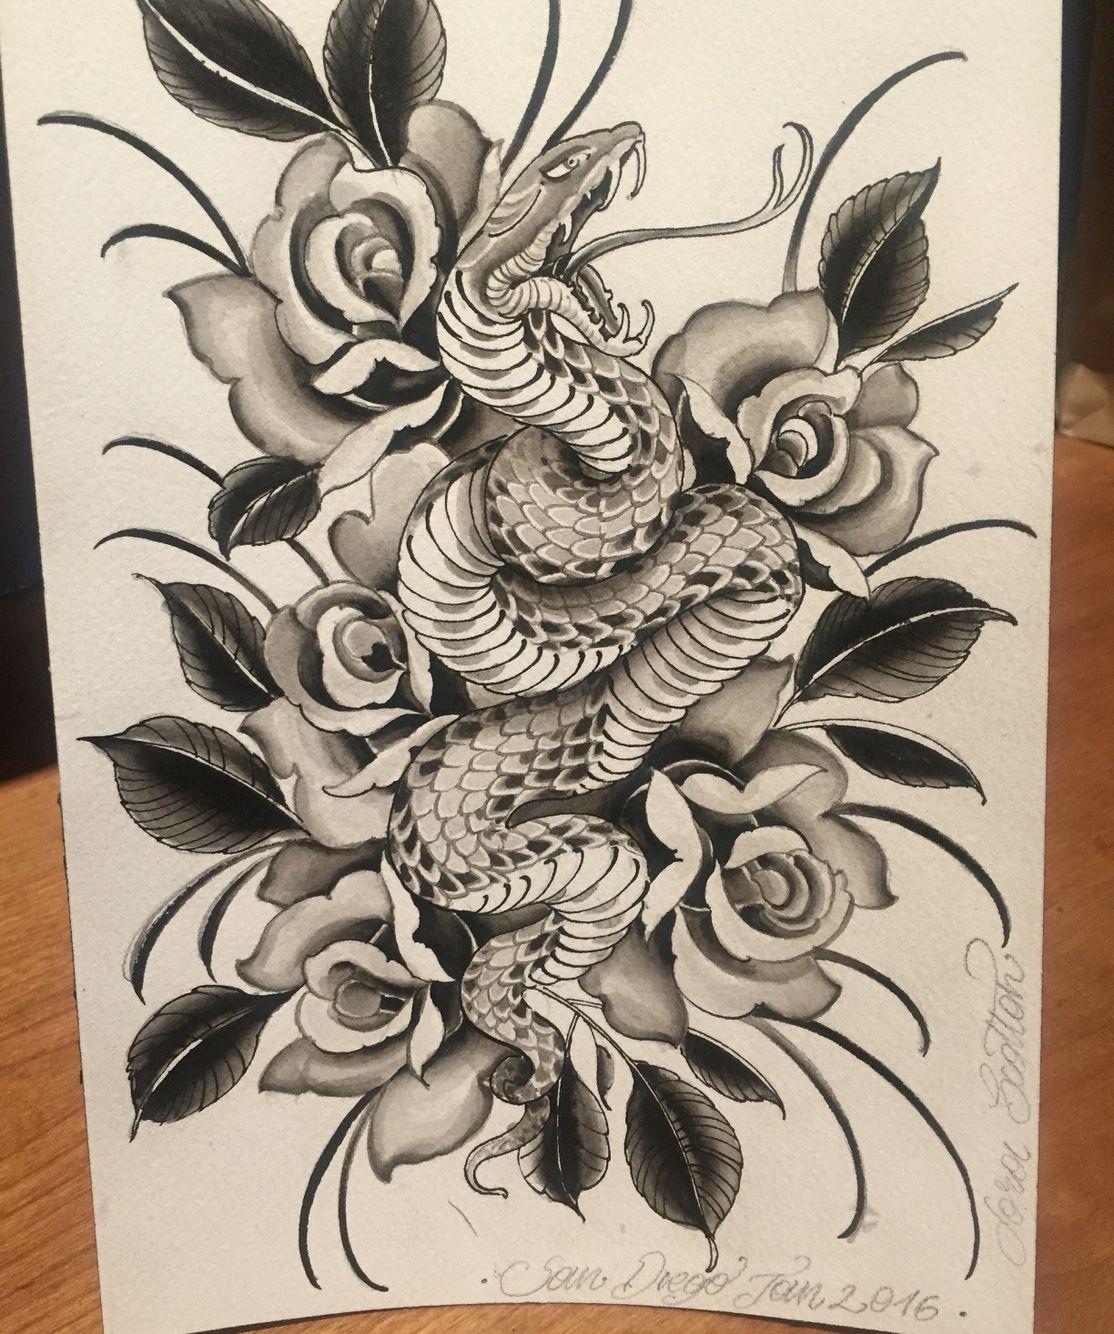 Snake Sandiego Larascotton Painting Illustration Japanese Snake Tattoo Traditional Snake Tattoo Body Art Tattoos